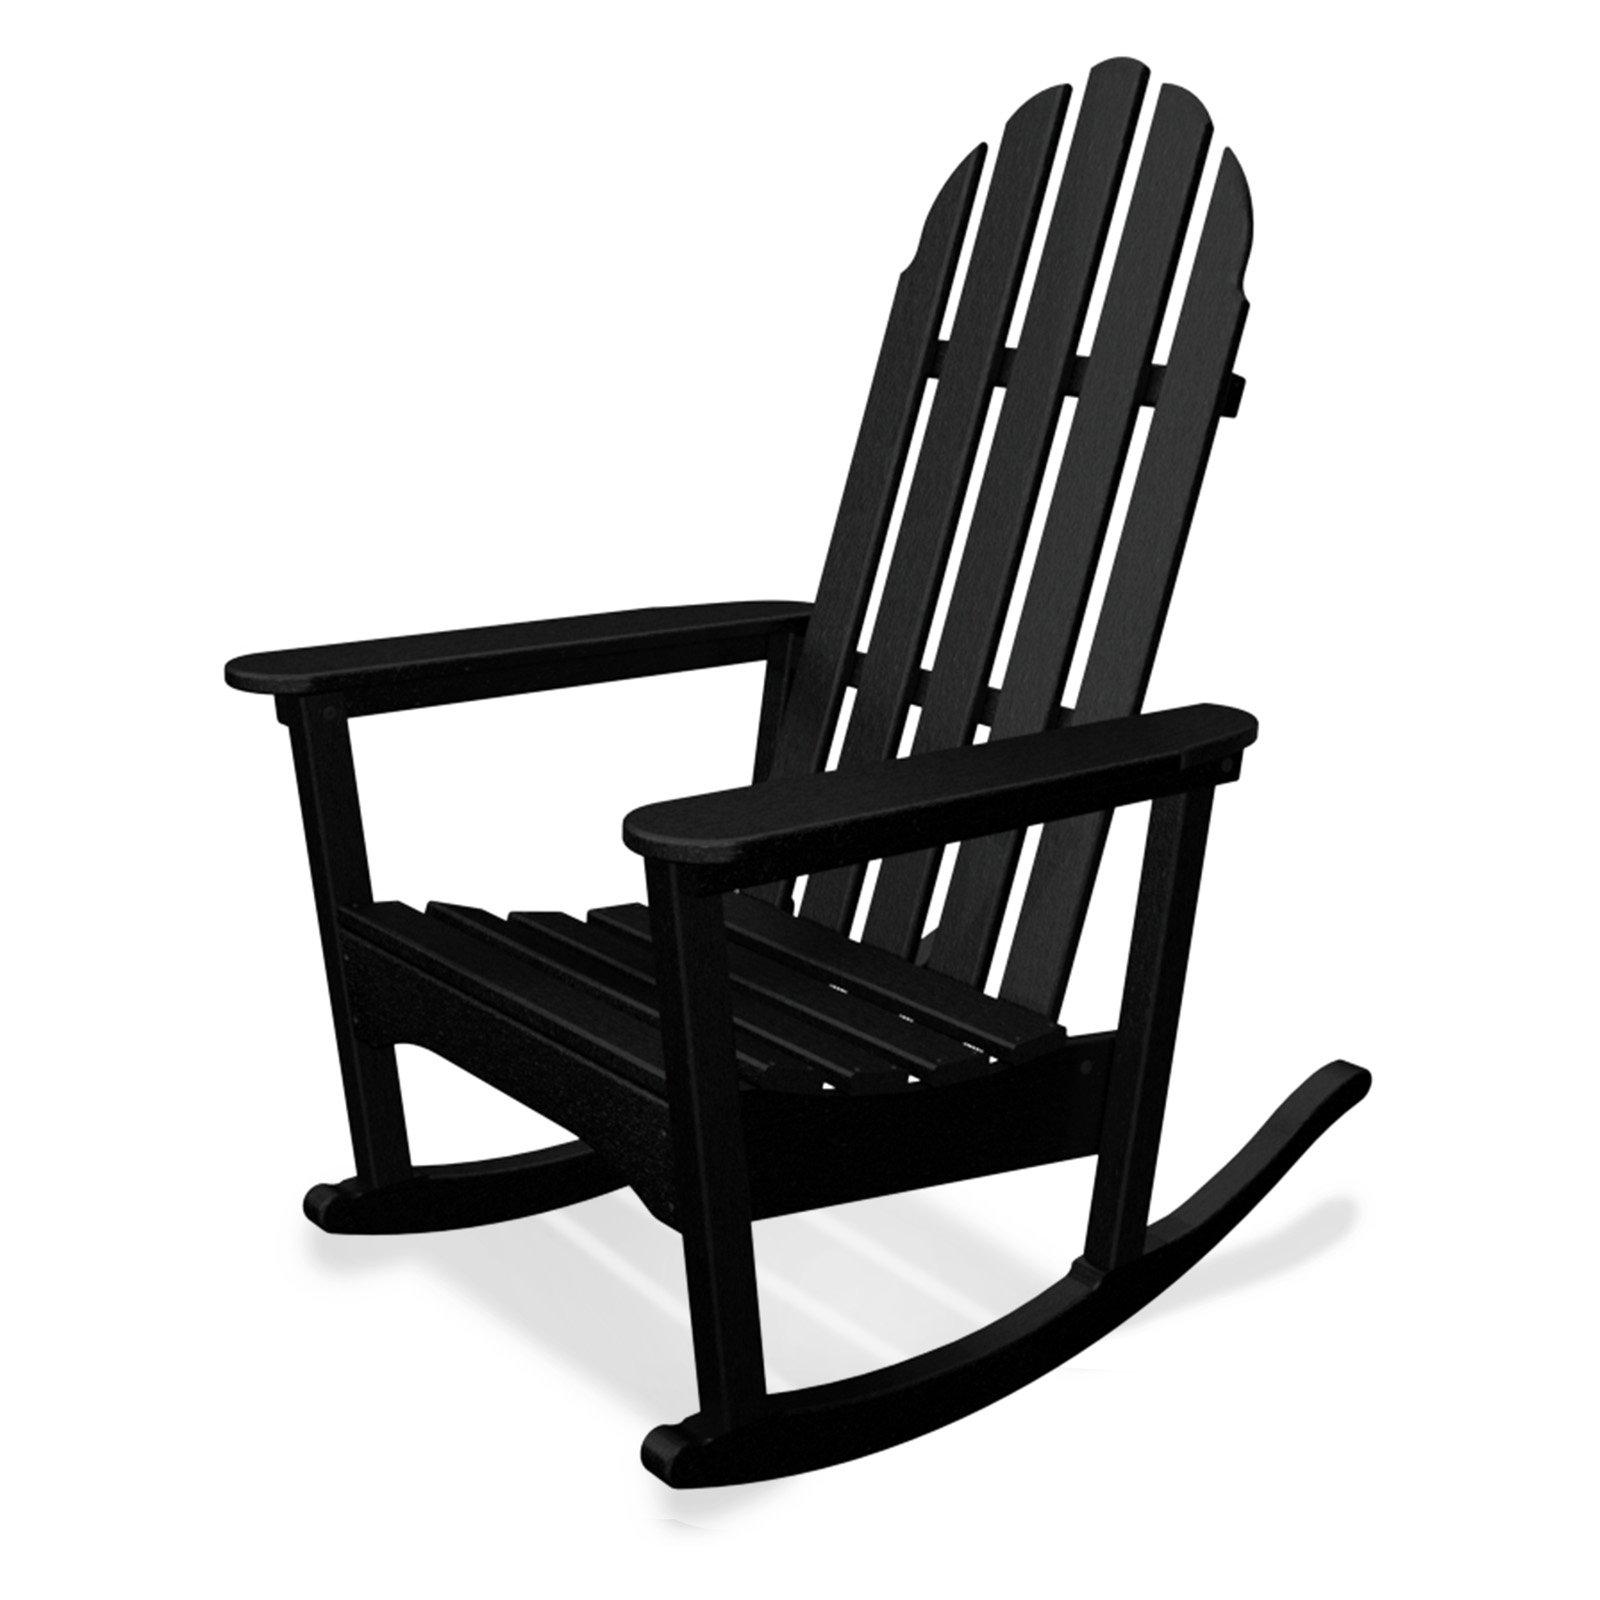 POLYWOOD® Classic Bimini Recycled Plastic Adirondack Rocking Chair